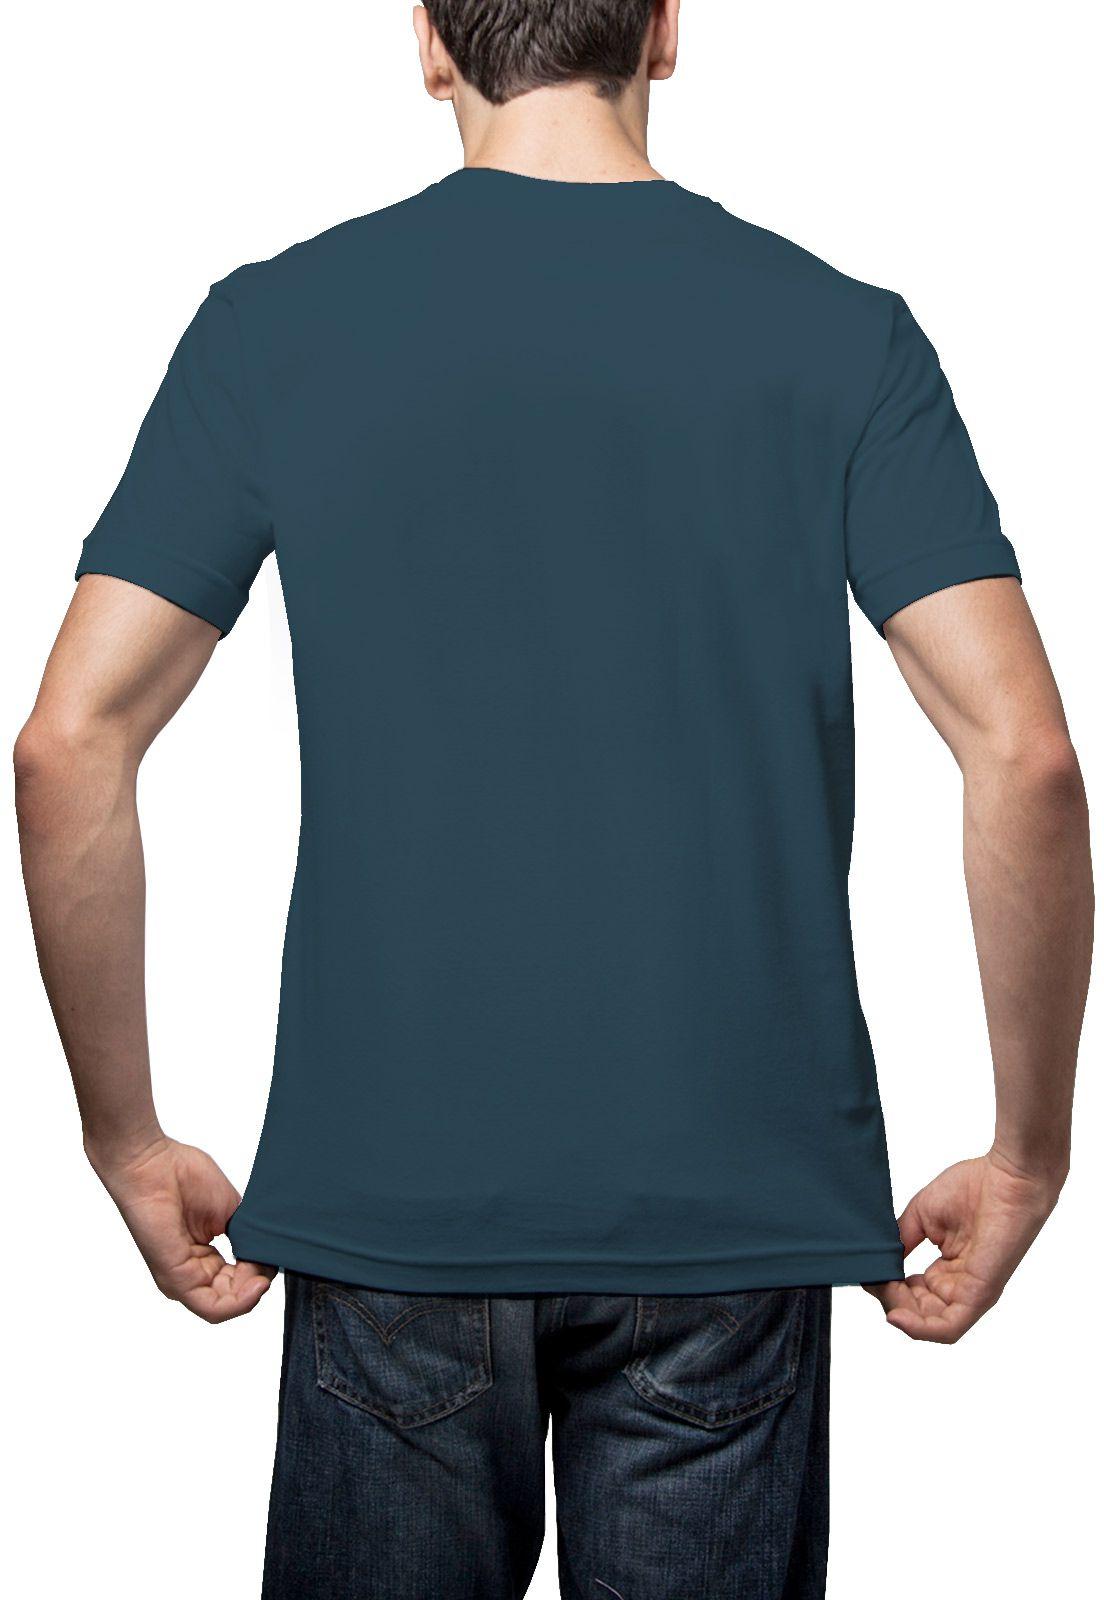 Camiseta Amazônia Básica Árvore Bordada Gola V - Azul Escuro